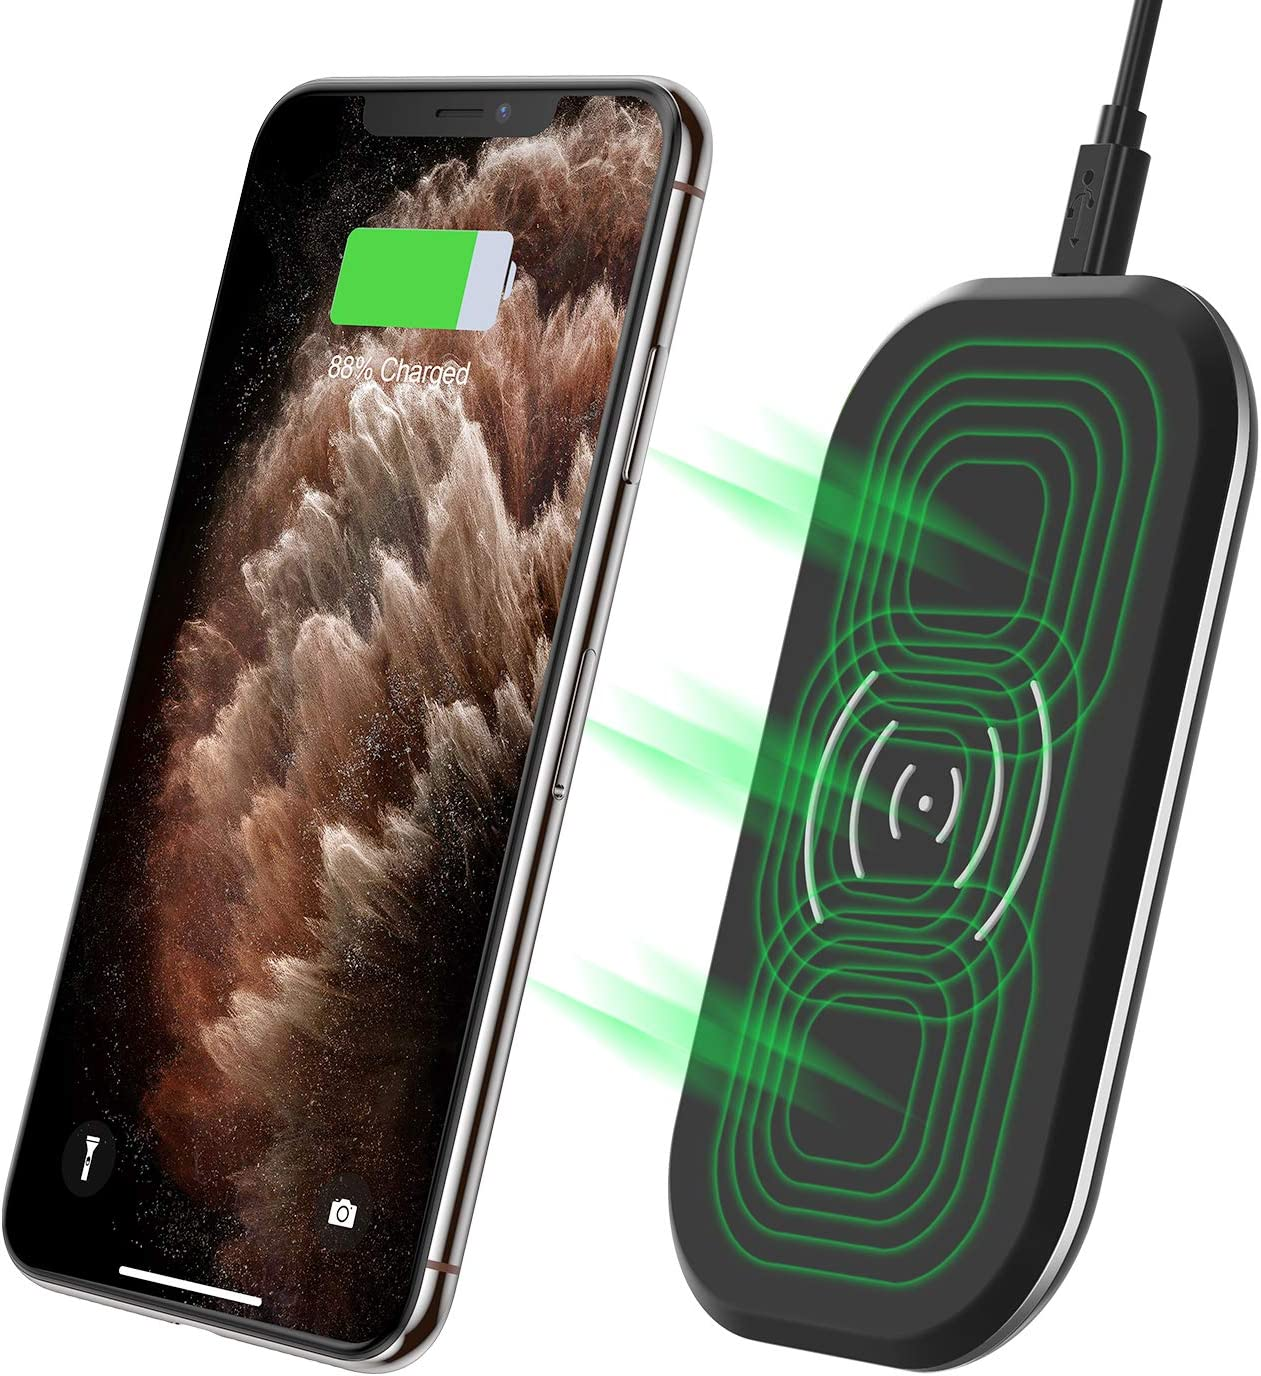 CHOETECH Cargador Inalámbrico Rápido, 3 Bobinas Qi Fast Wireless Charger 10W para Samsung S10/S10 Plus/S9/S8/Note10/Note9, 7.5W para iPhone 11/11pro/XS/XS MAX/XR/X/8 Plus y 5W Teléfonos Qi-Enabled